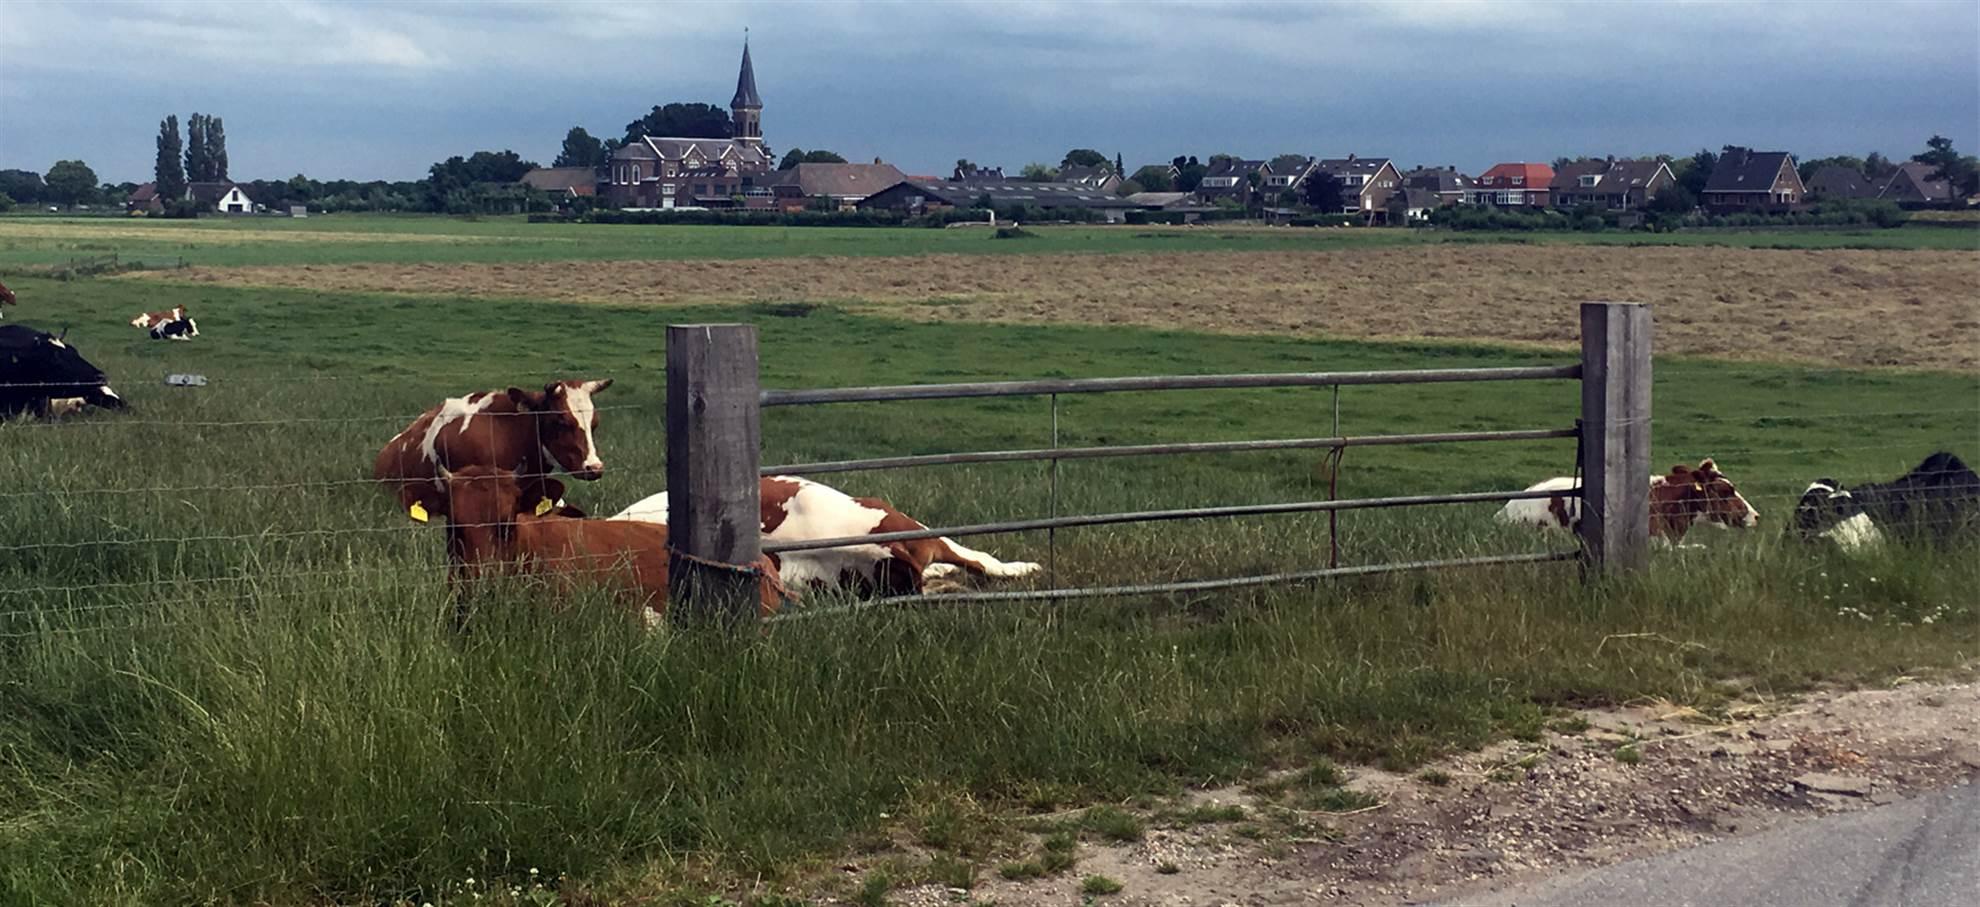 Fietsrit over het Nederlandse platteland: 'polder', windmolens, meren en kaas